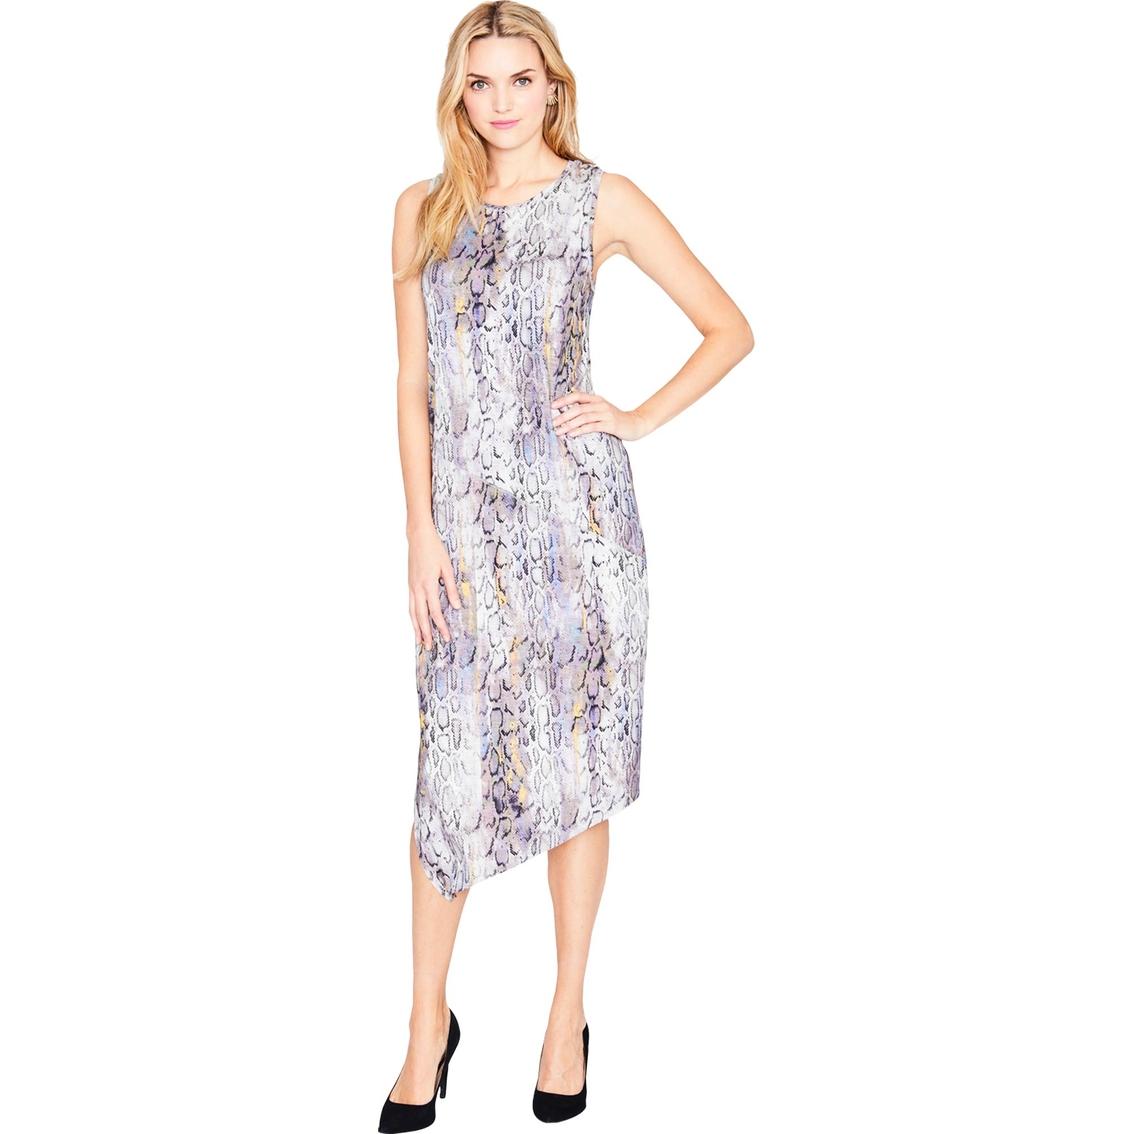 Rachel Roy Discount Gowns: Rachel Roy Printed Drape Back Dress